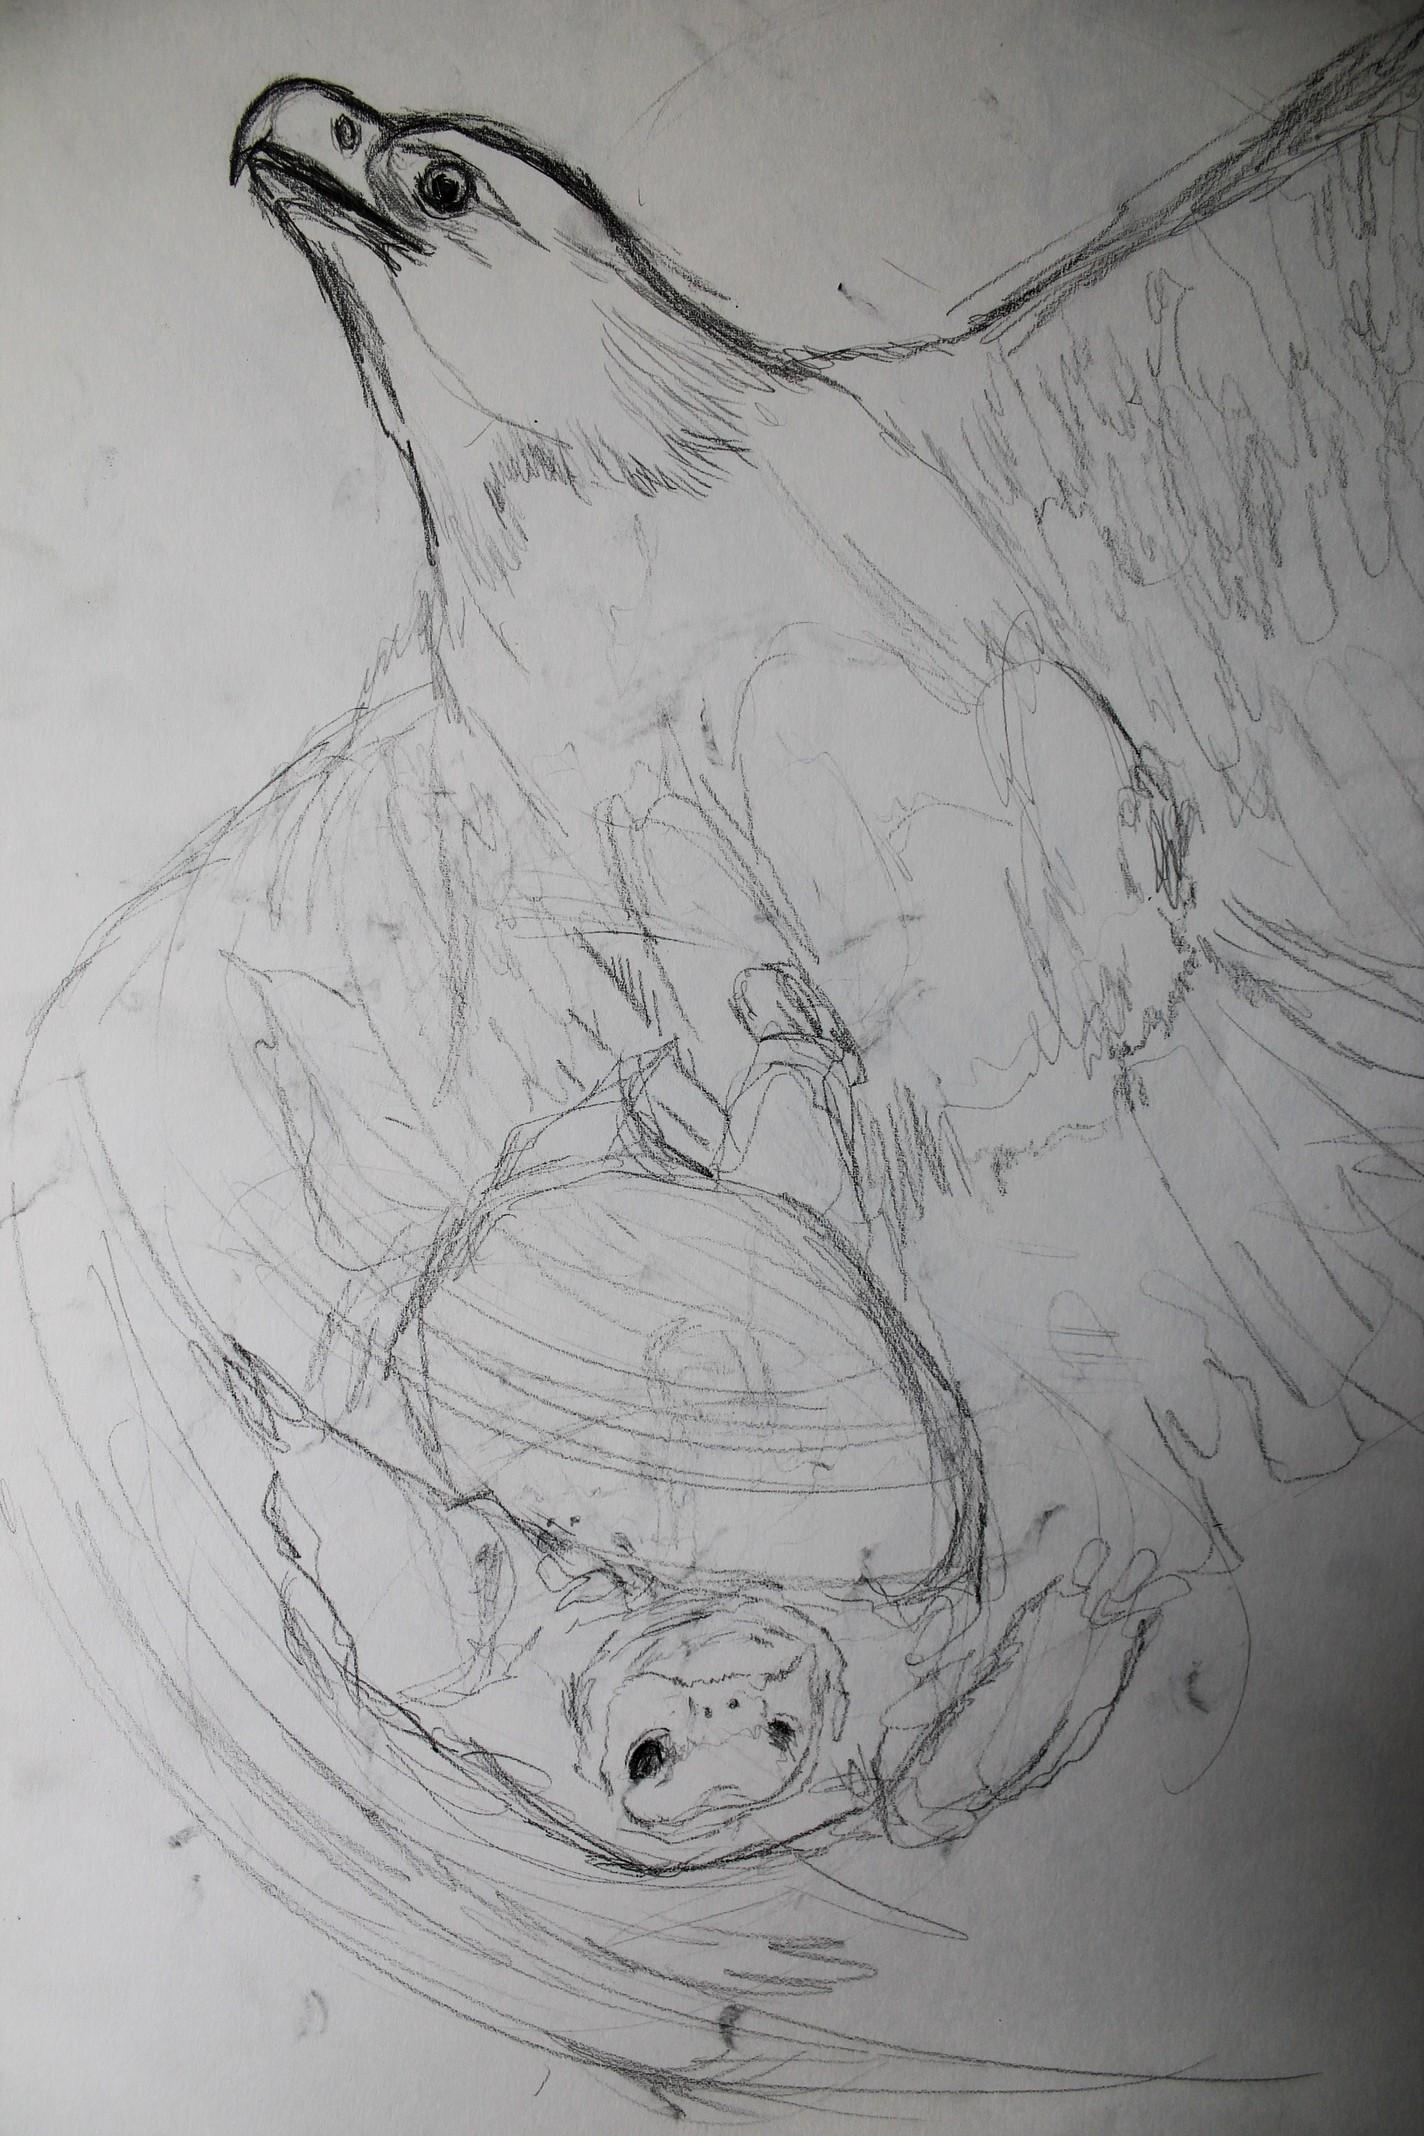 eagle-tortoise-sketch4.jpg.JPG